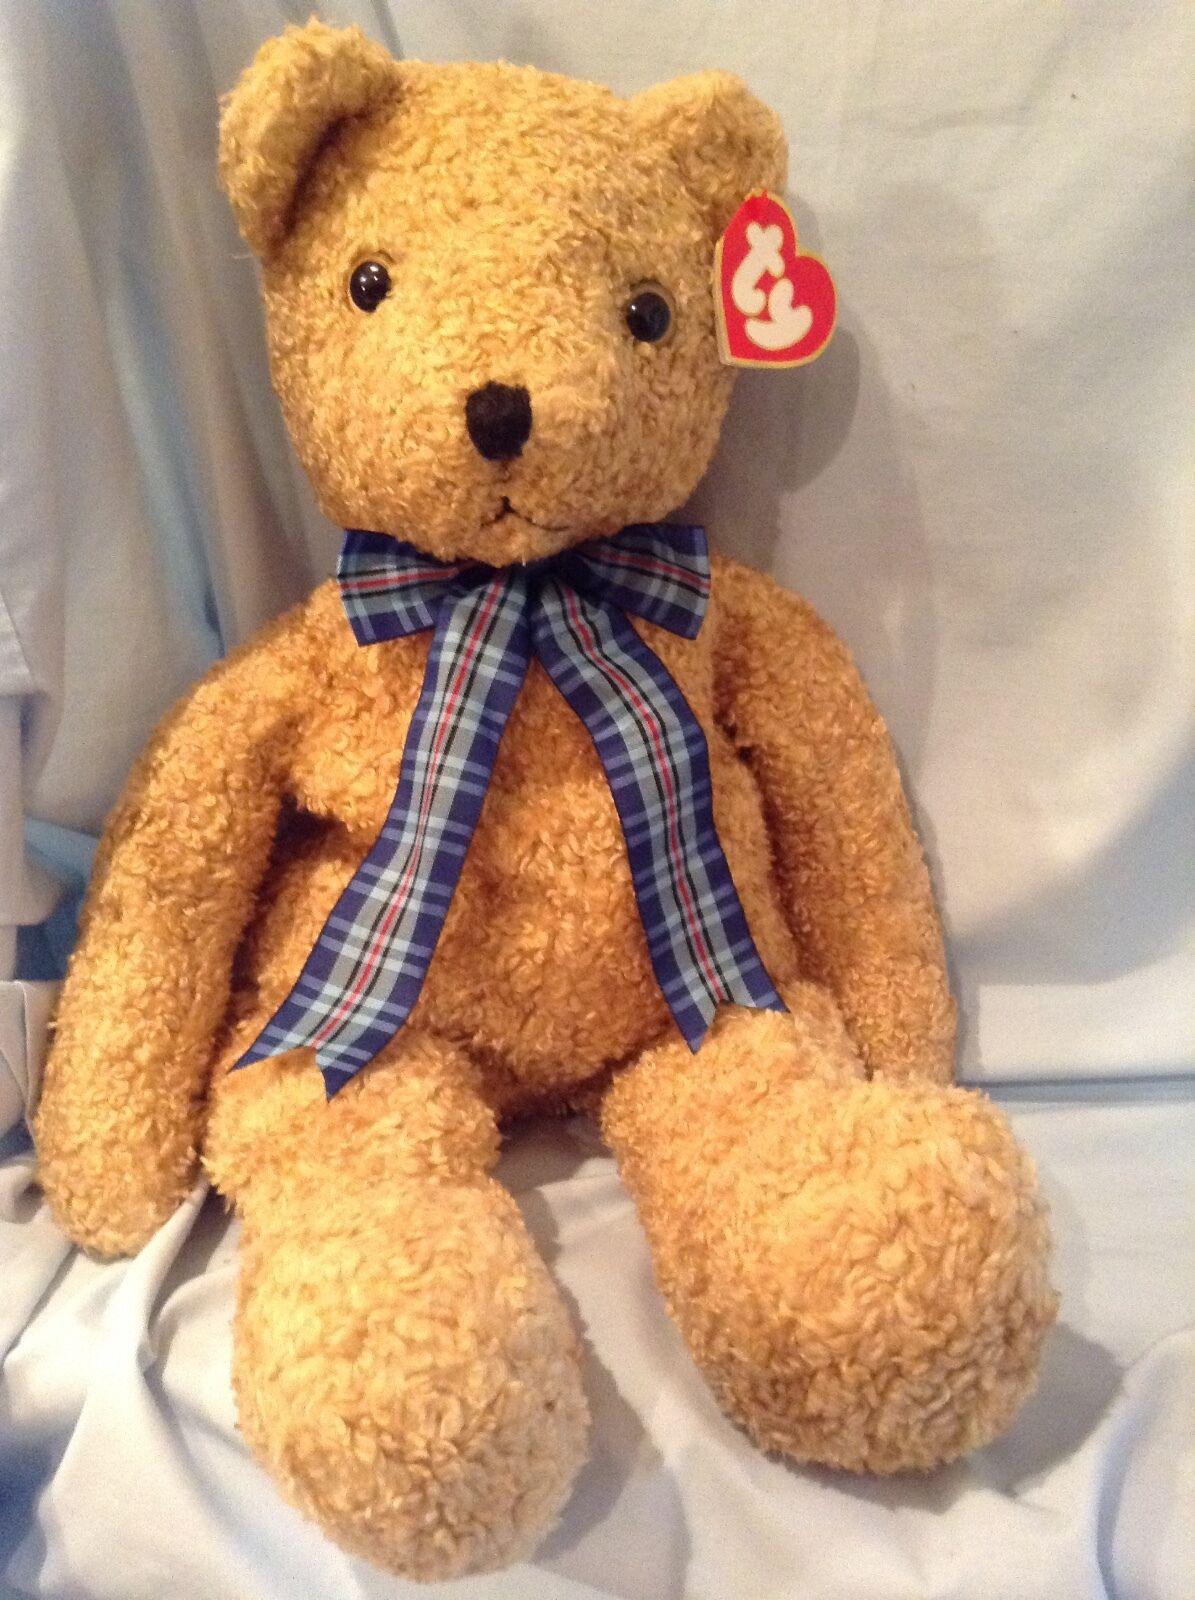 Ty Lg. Curly gold Bear Korea 24  P.E. Pellets 1991 Girls Boys 3+  49.99